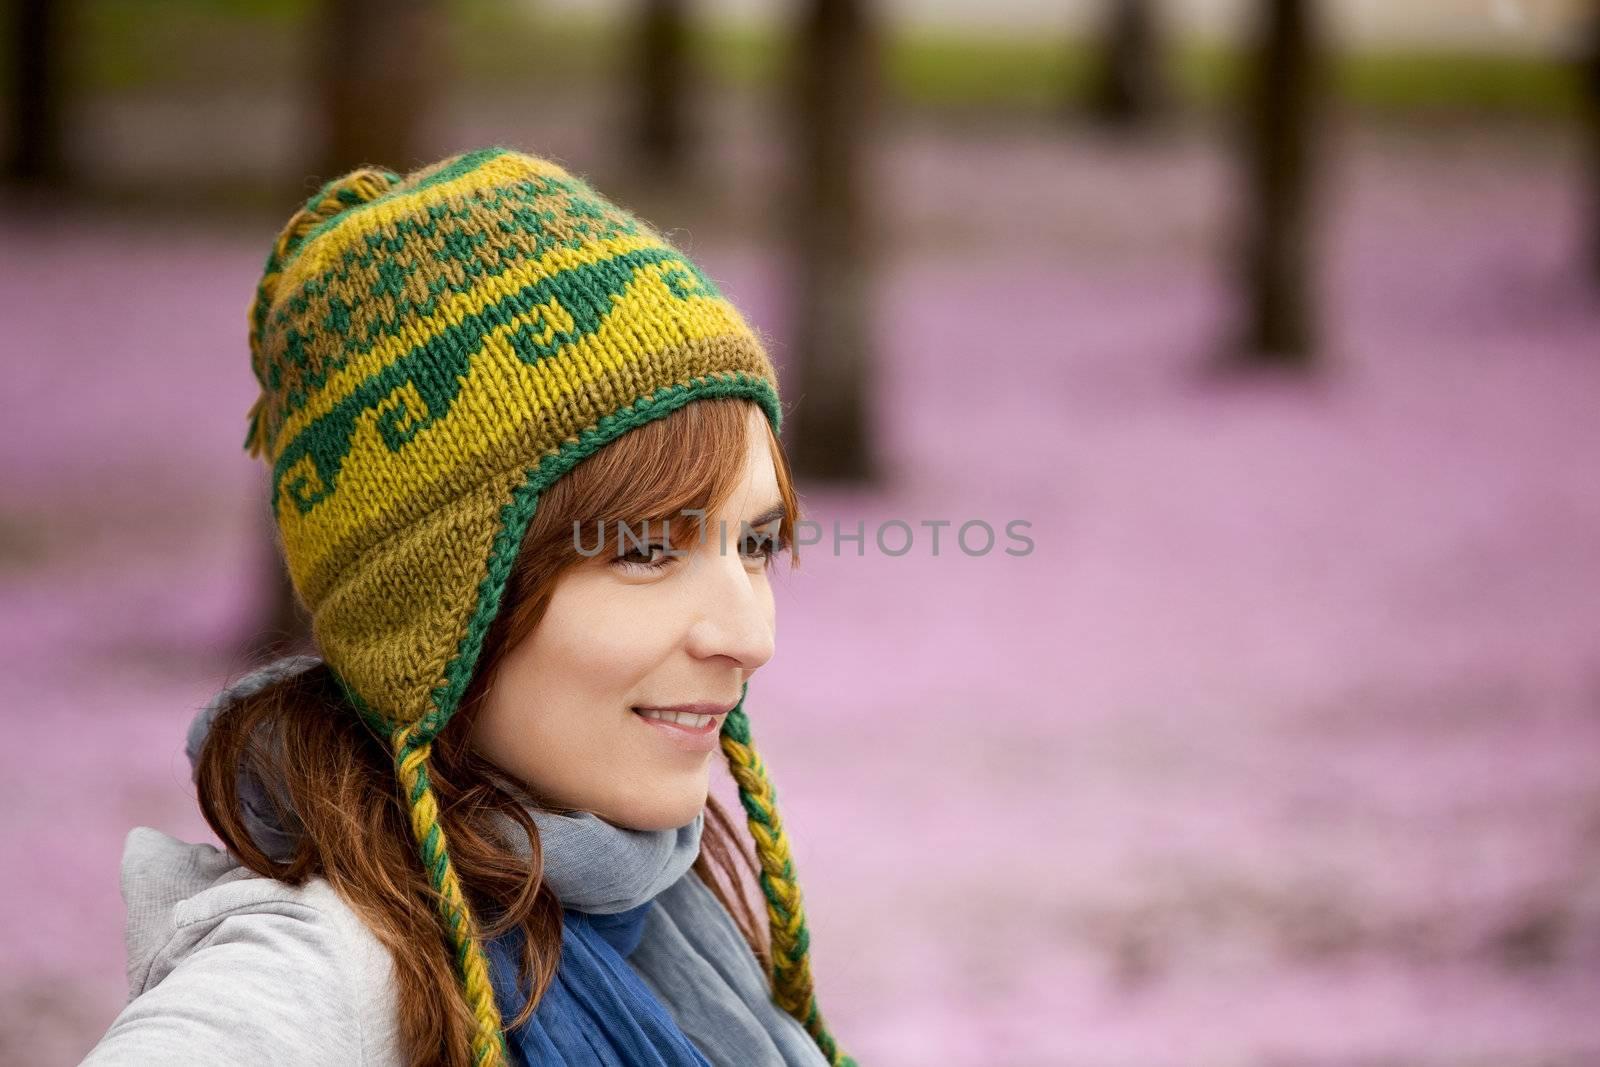 Beautiful and natural girl enjoying the autumn season